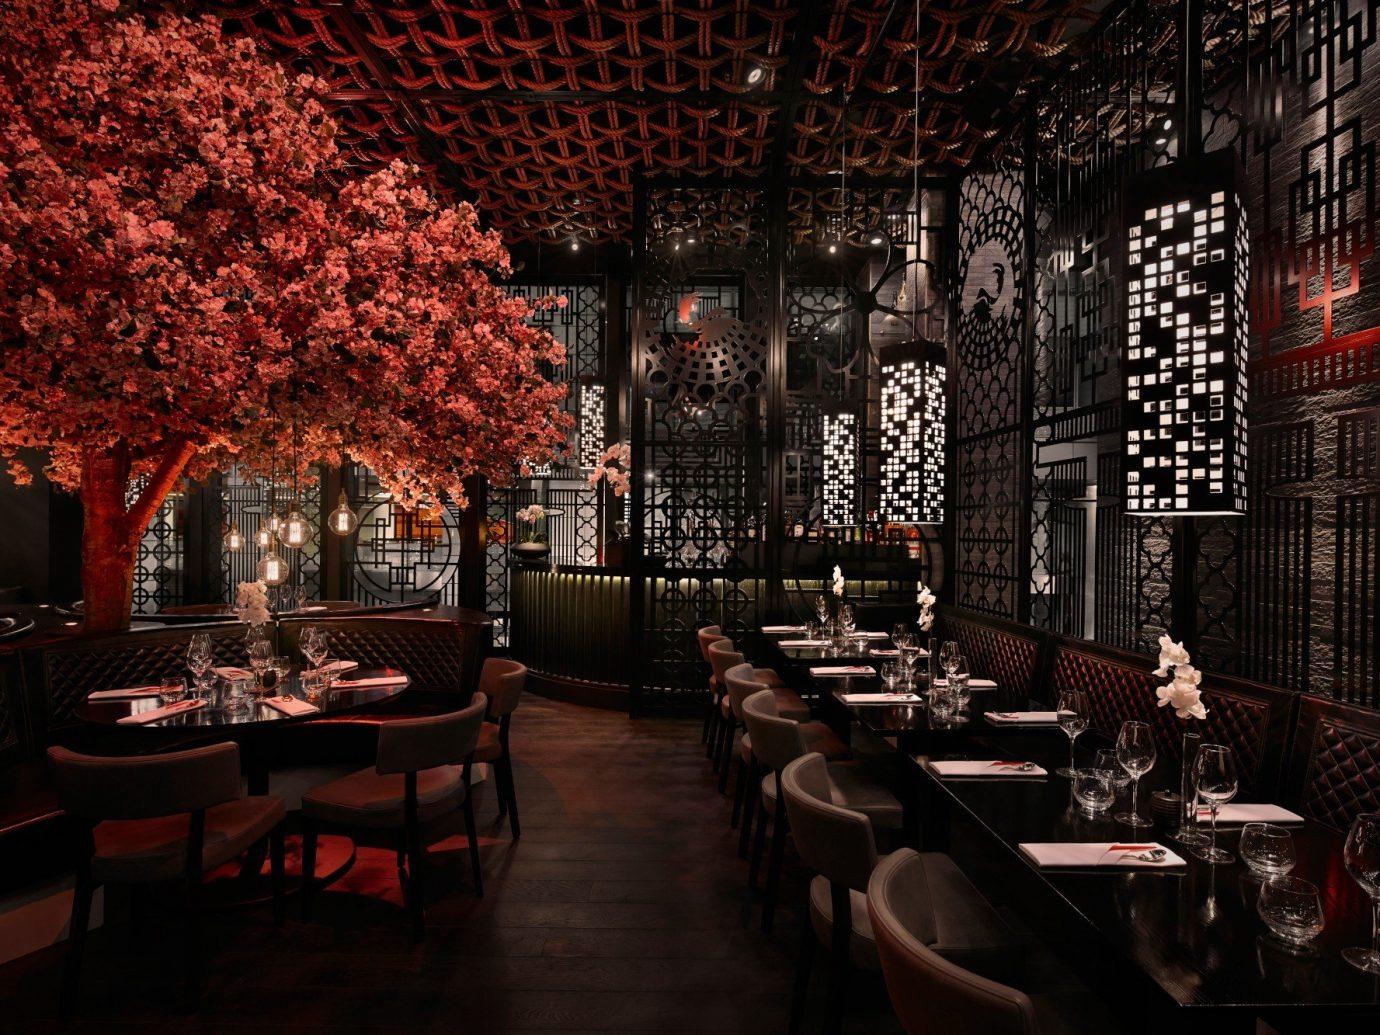 Jetsetter Guides indoor room lighting restaurant Bar interior design furniture area several